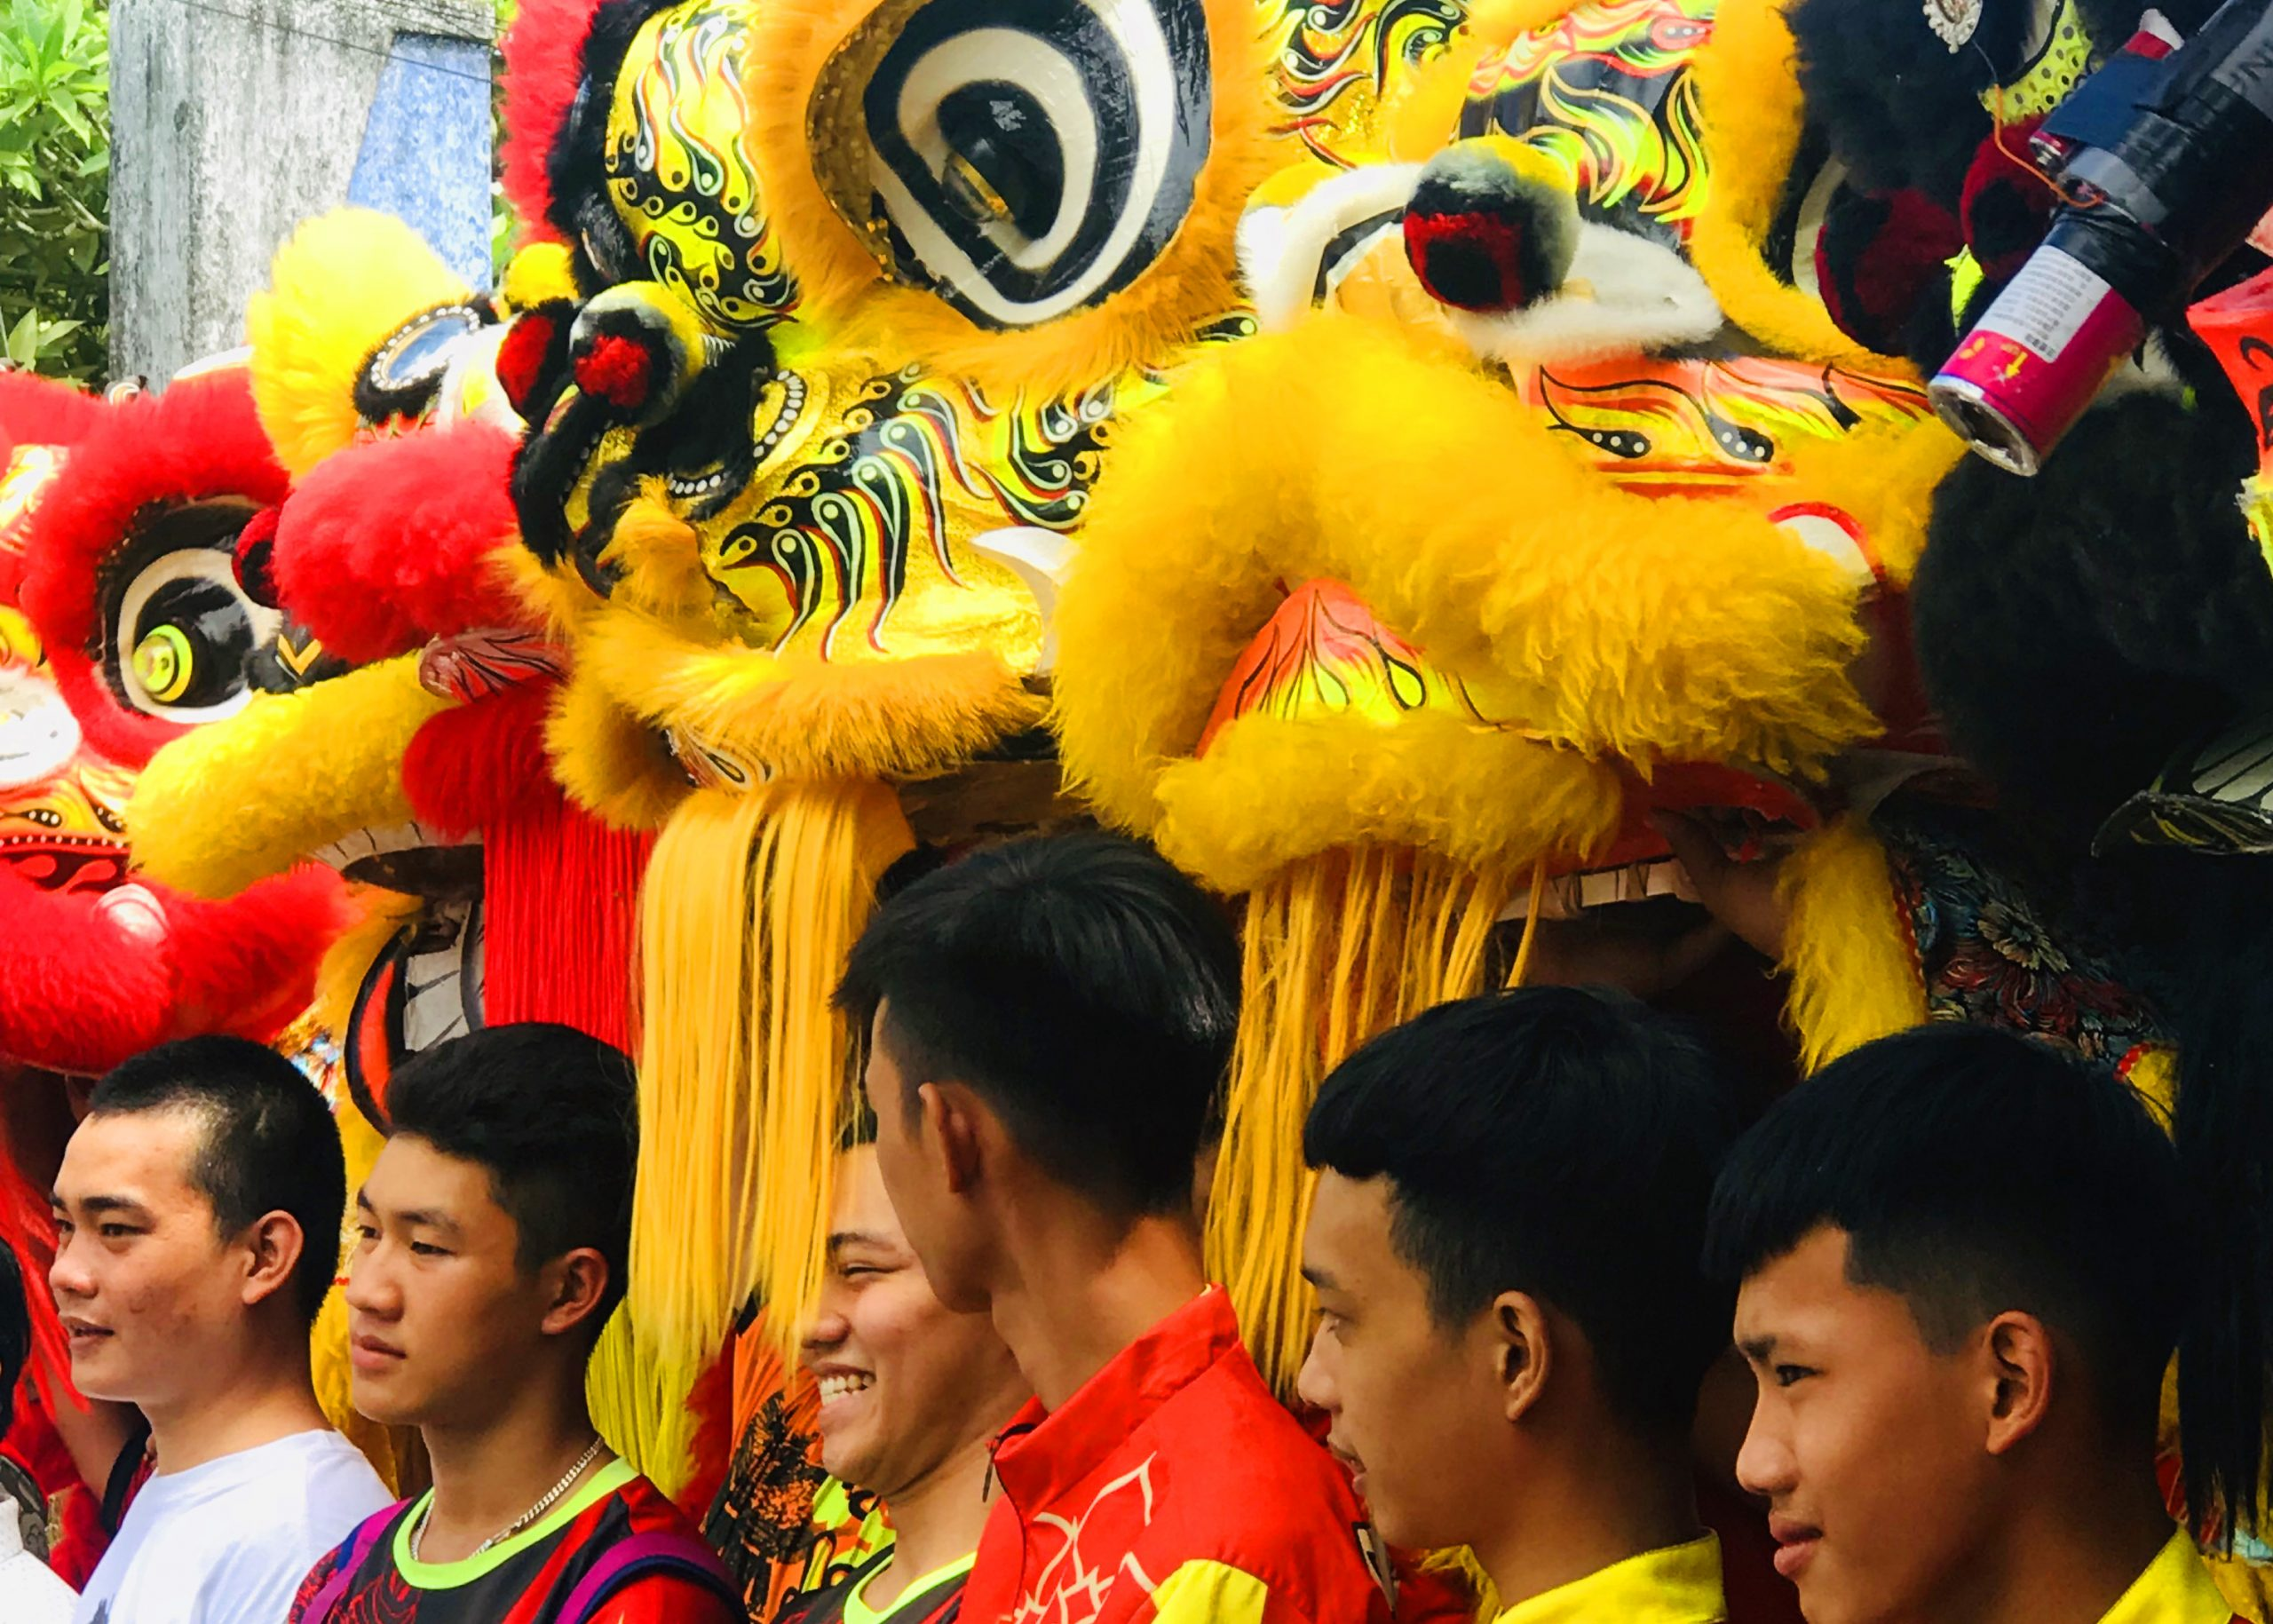 Boys with dragon masks, Hoi An, Vietnam